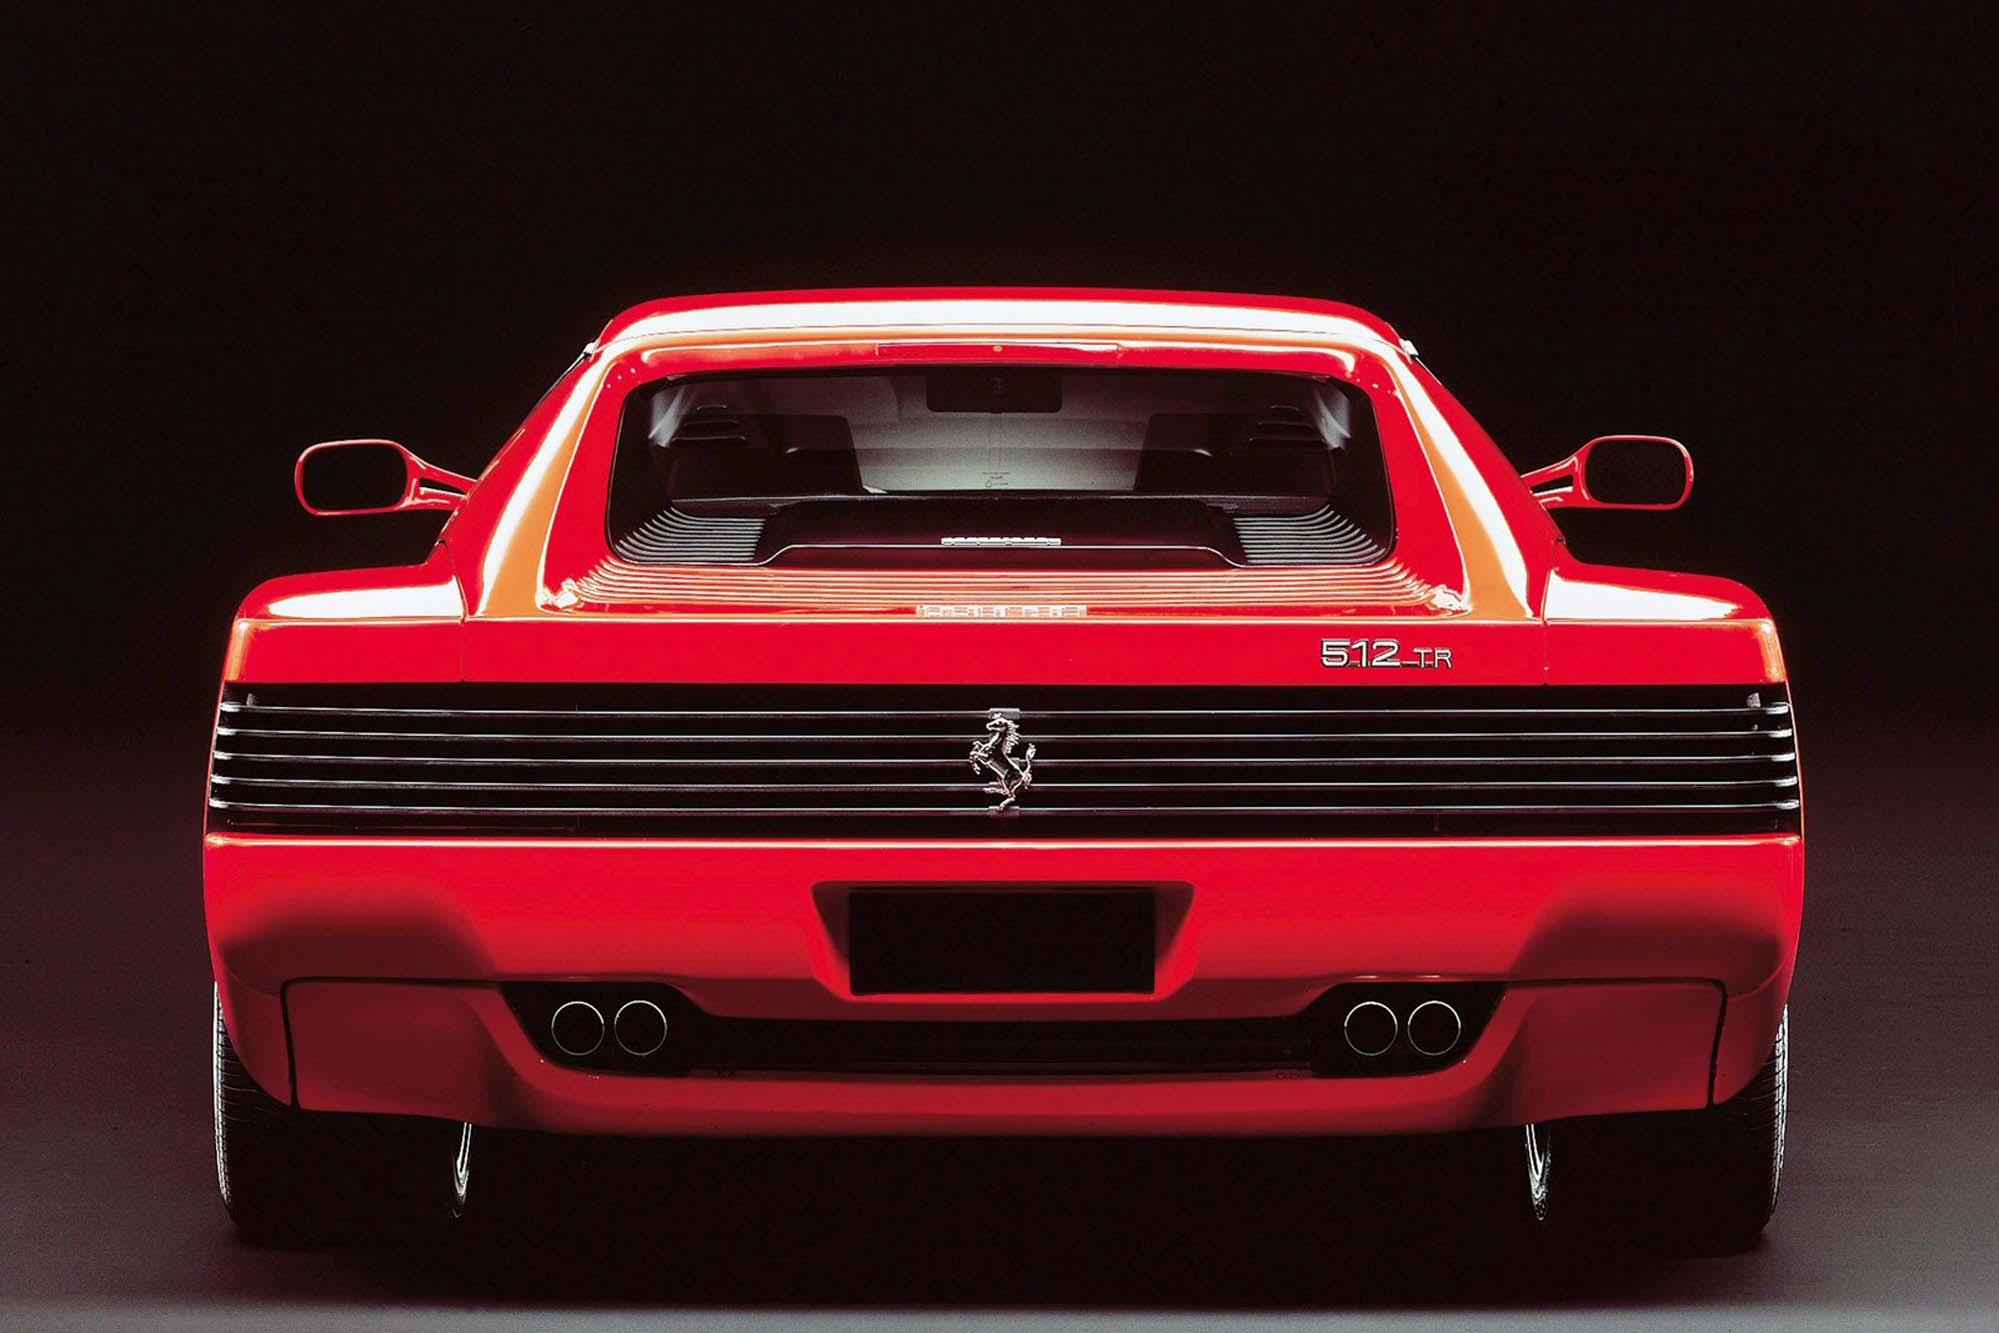 Ferrari Testarossa Wallpapers Wallpaper Cave